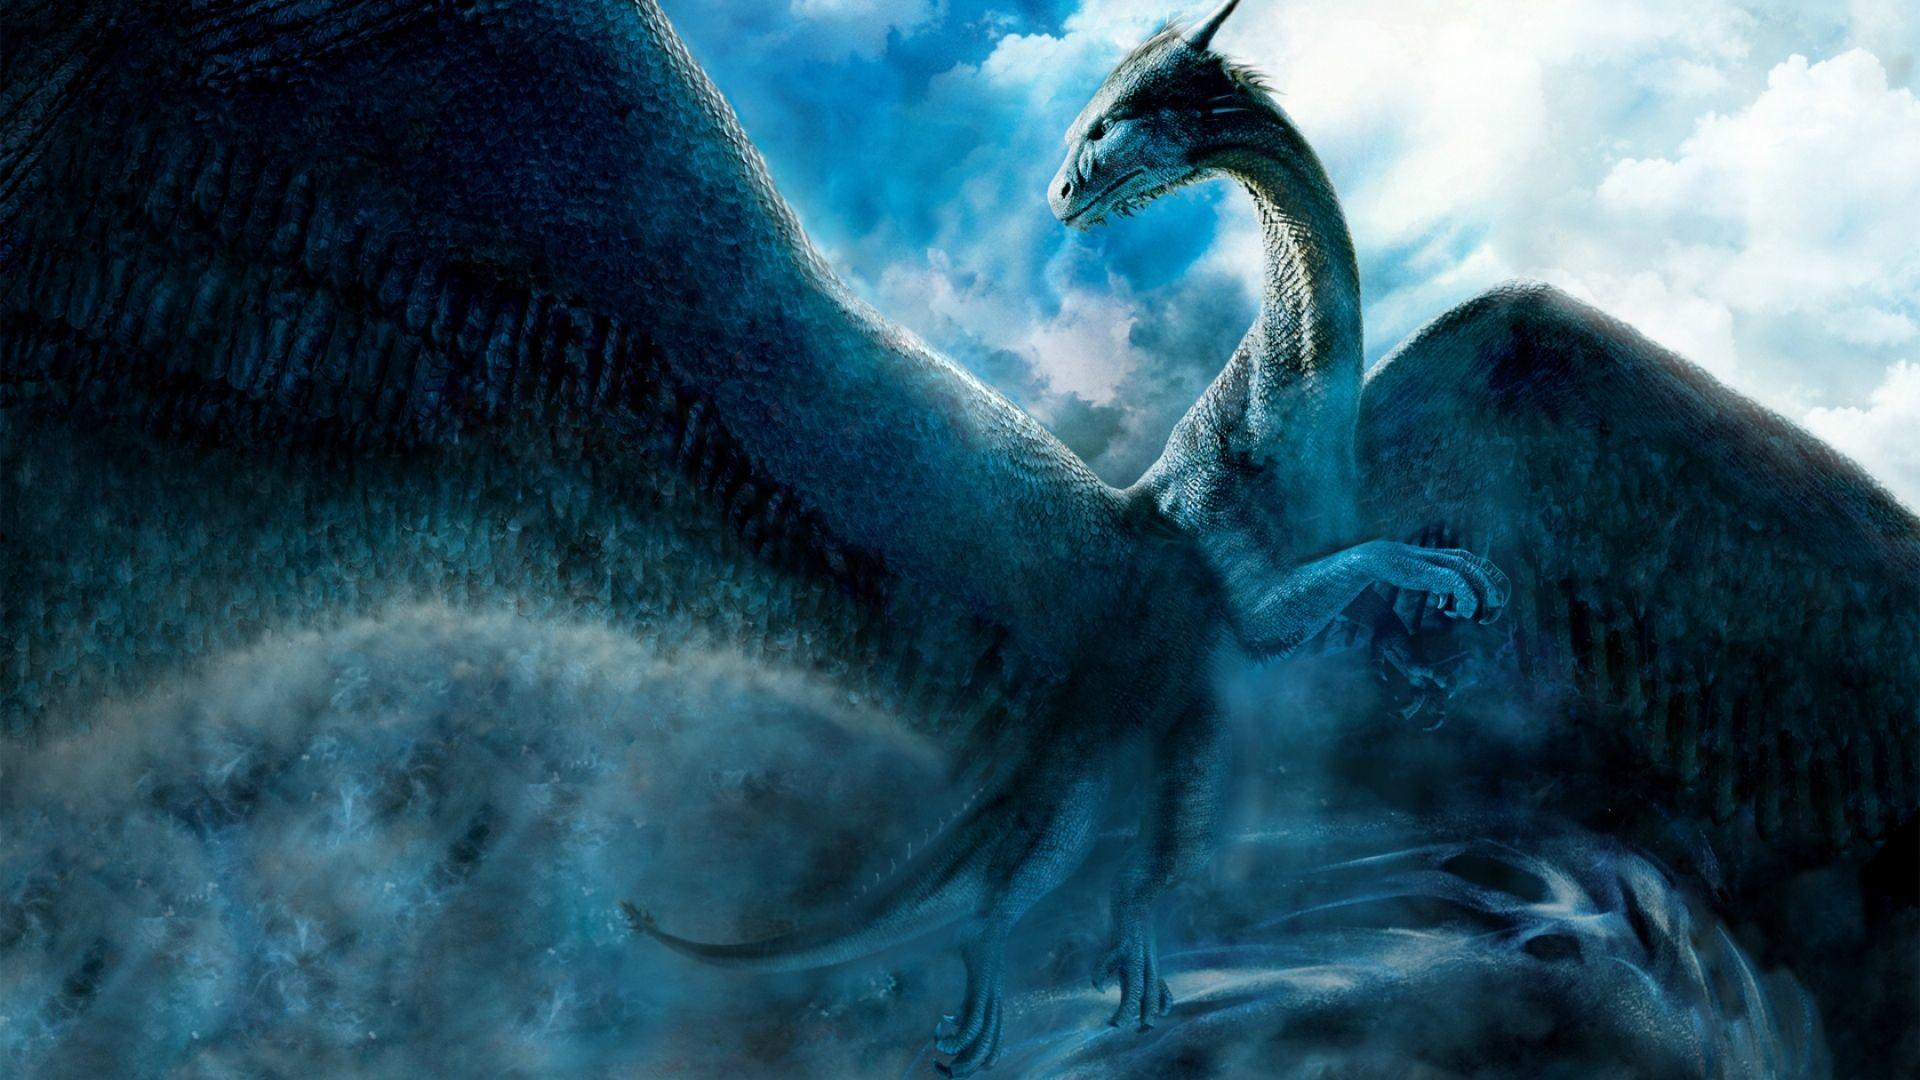 Water Dragon Wallpaper (76+ images)  Water Dragon Wa...